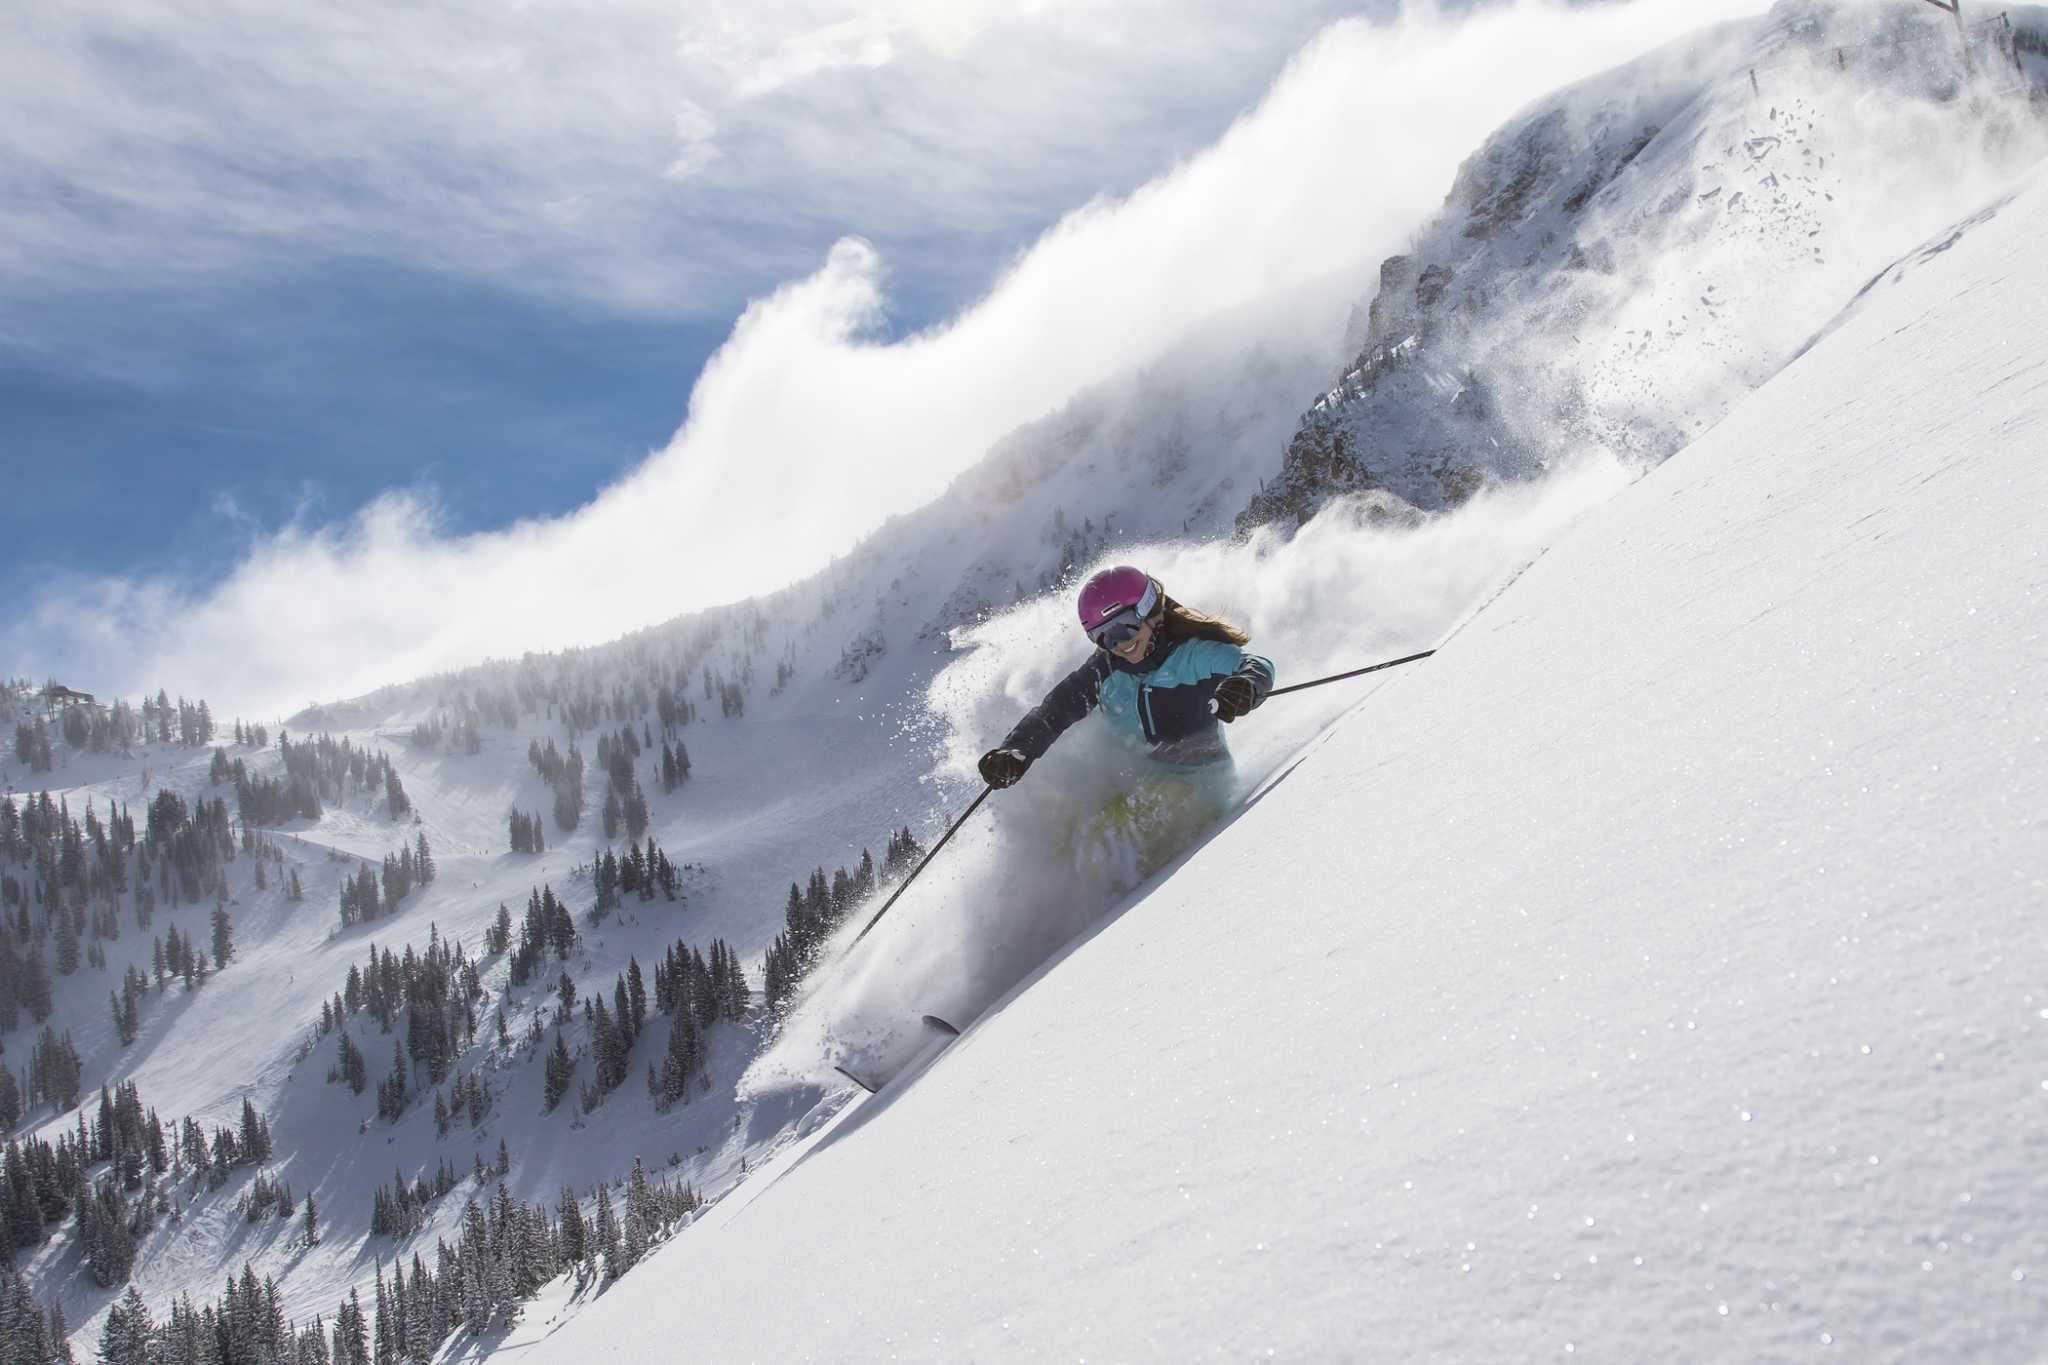 Old-school vibe is peak attraction at these Utah ski spots ...